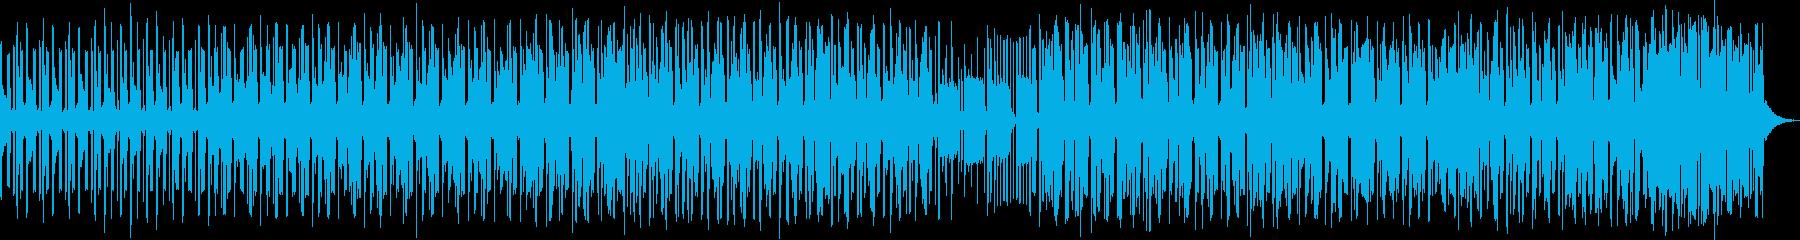 fishfgの再生済みの波形